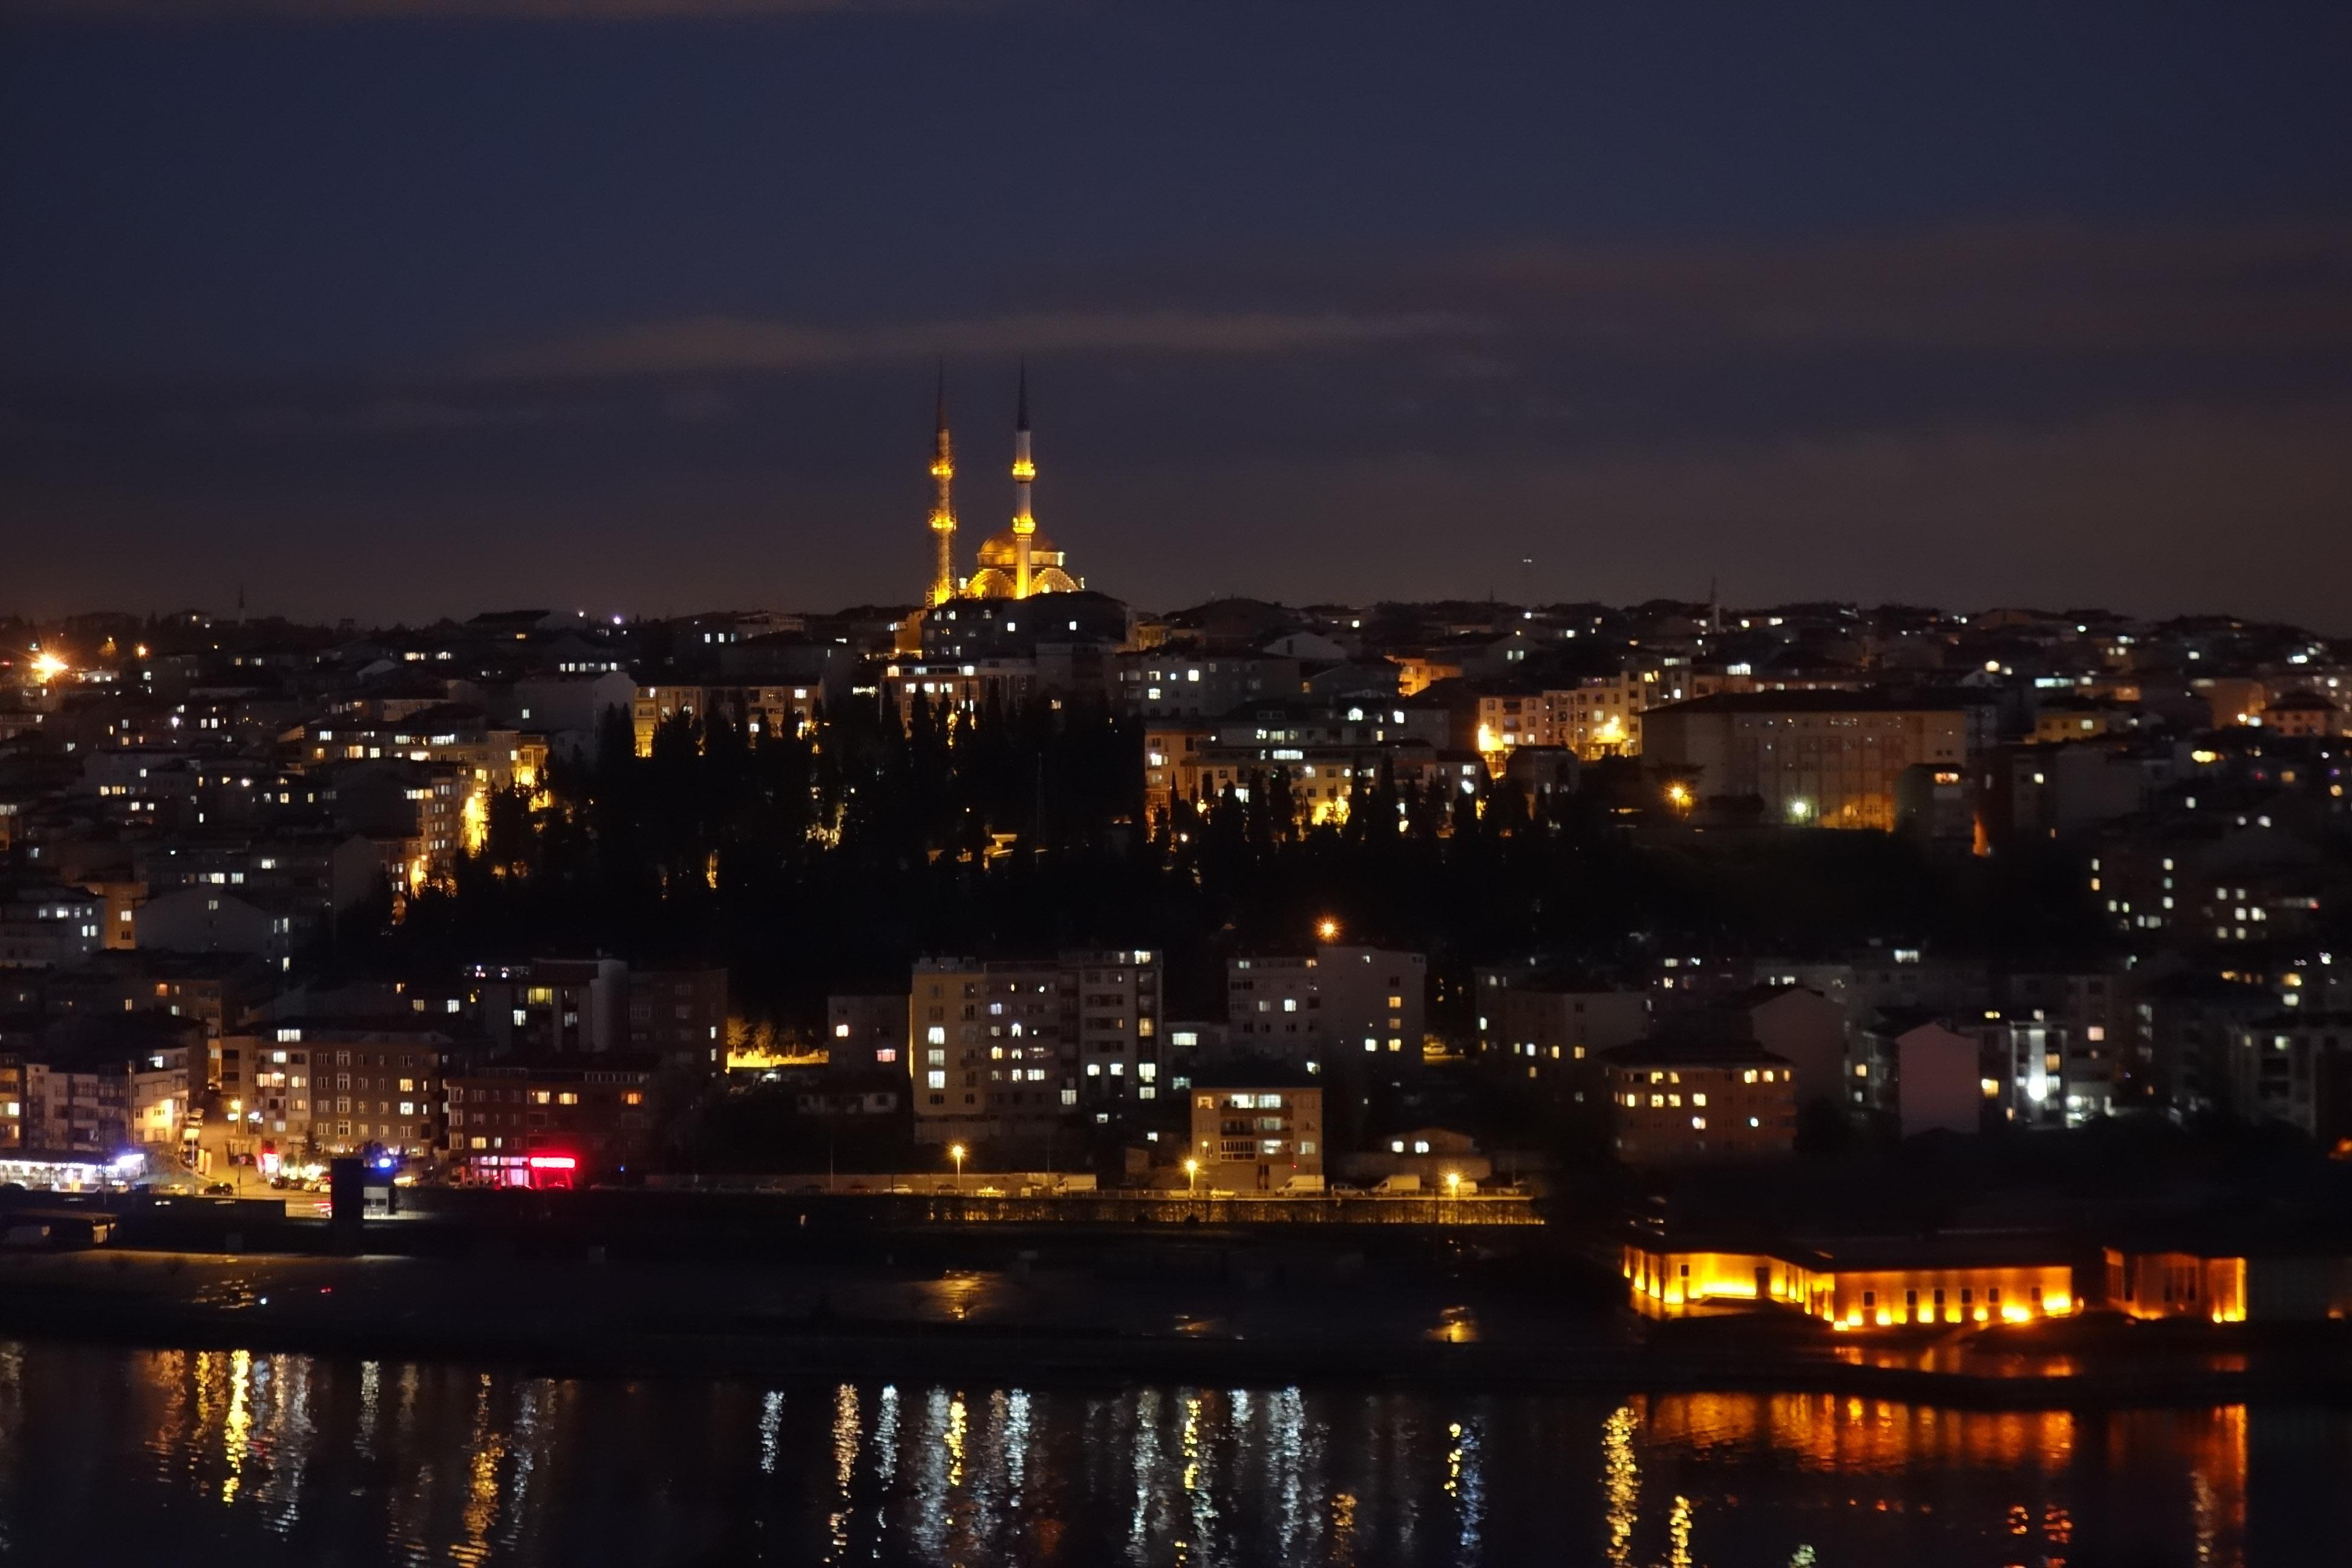 Particolare della vista dal cafè Pierre Loti a Eyup: la moschea Bademlik